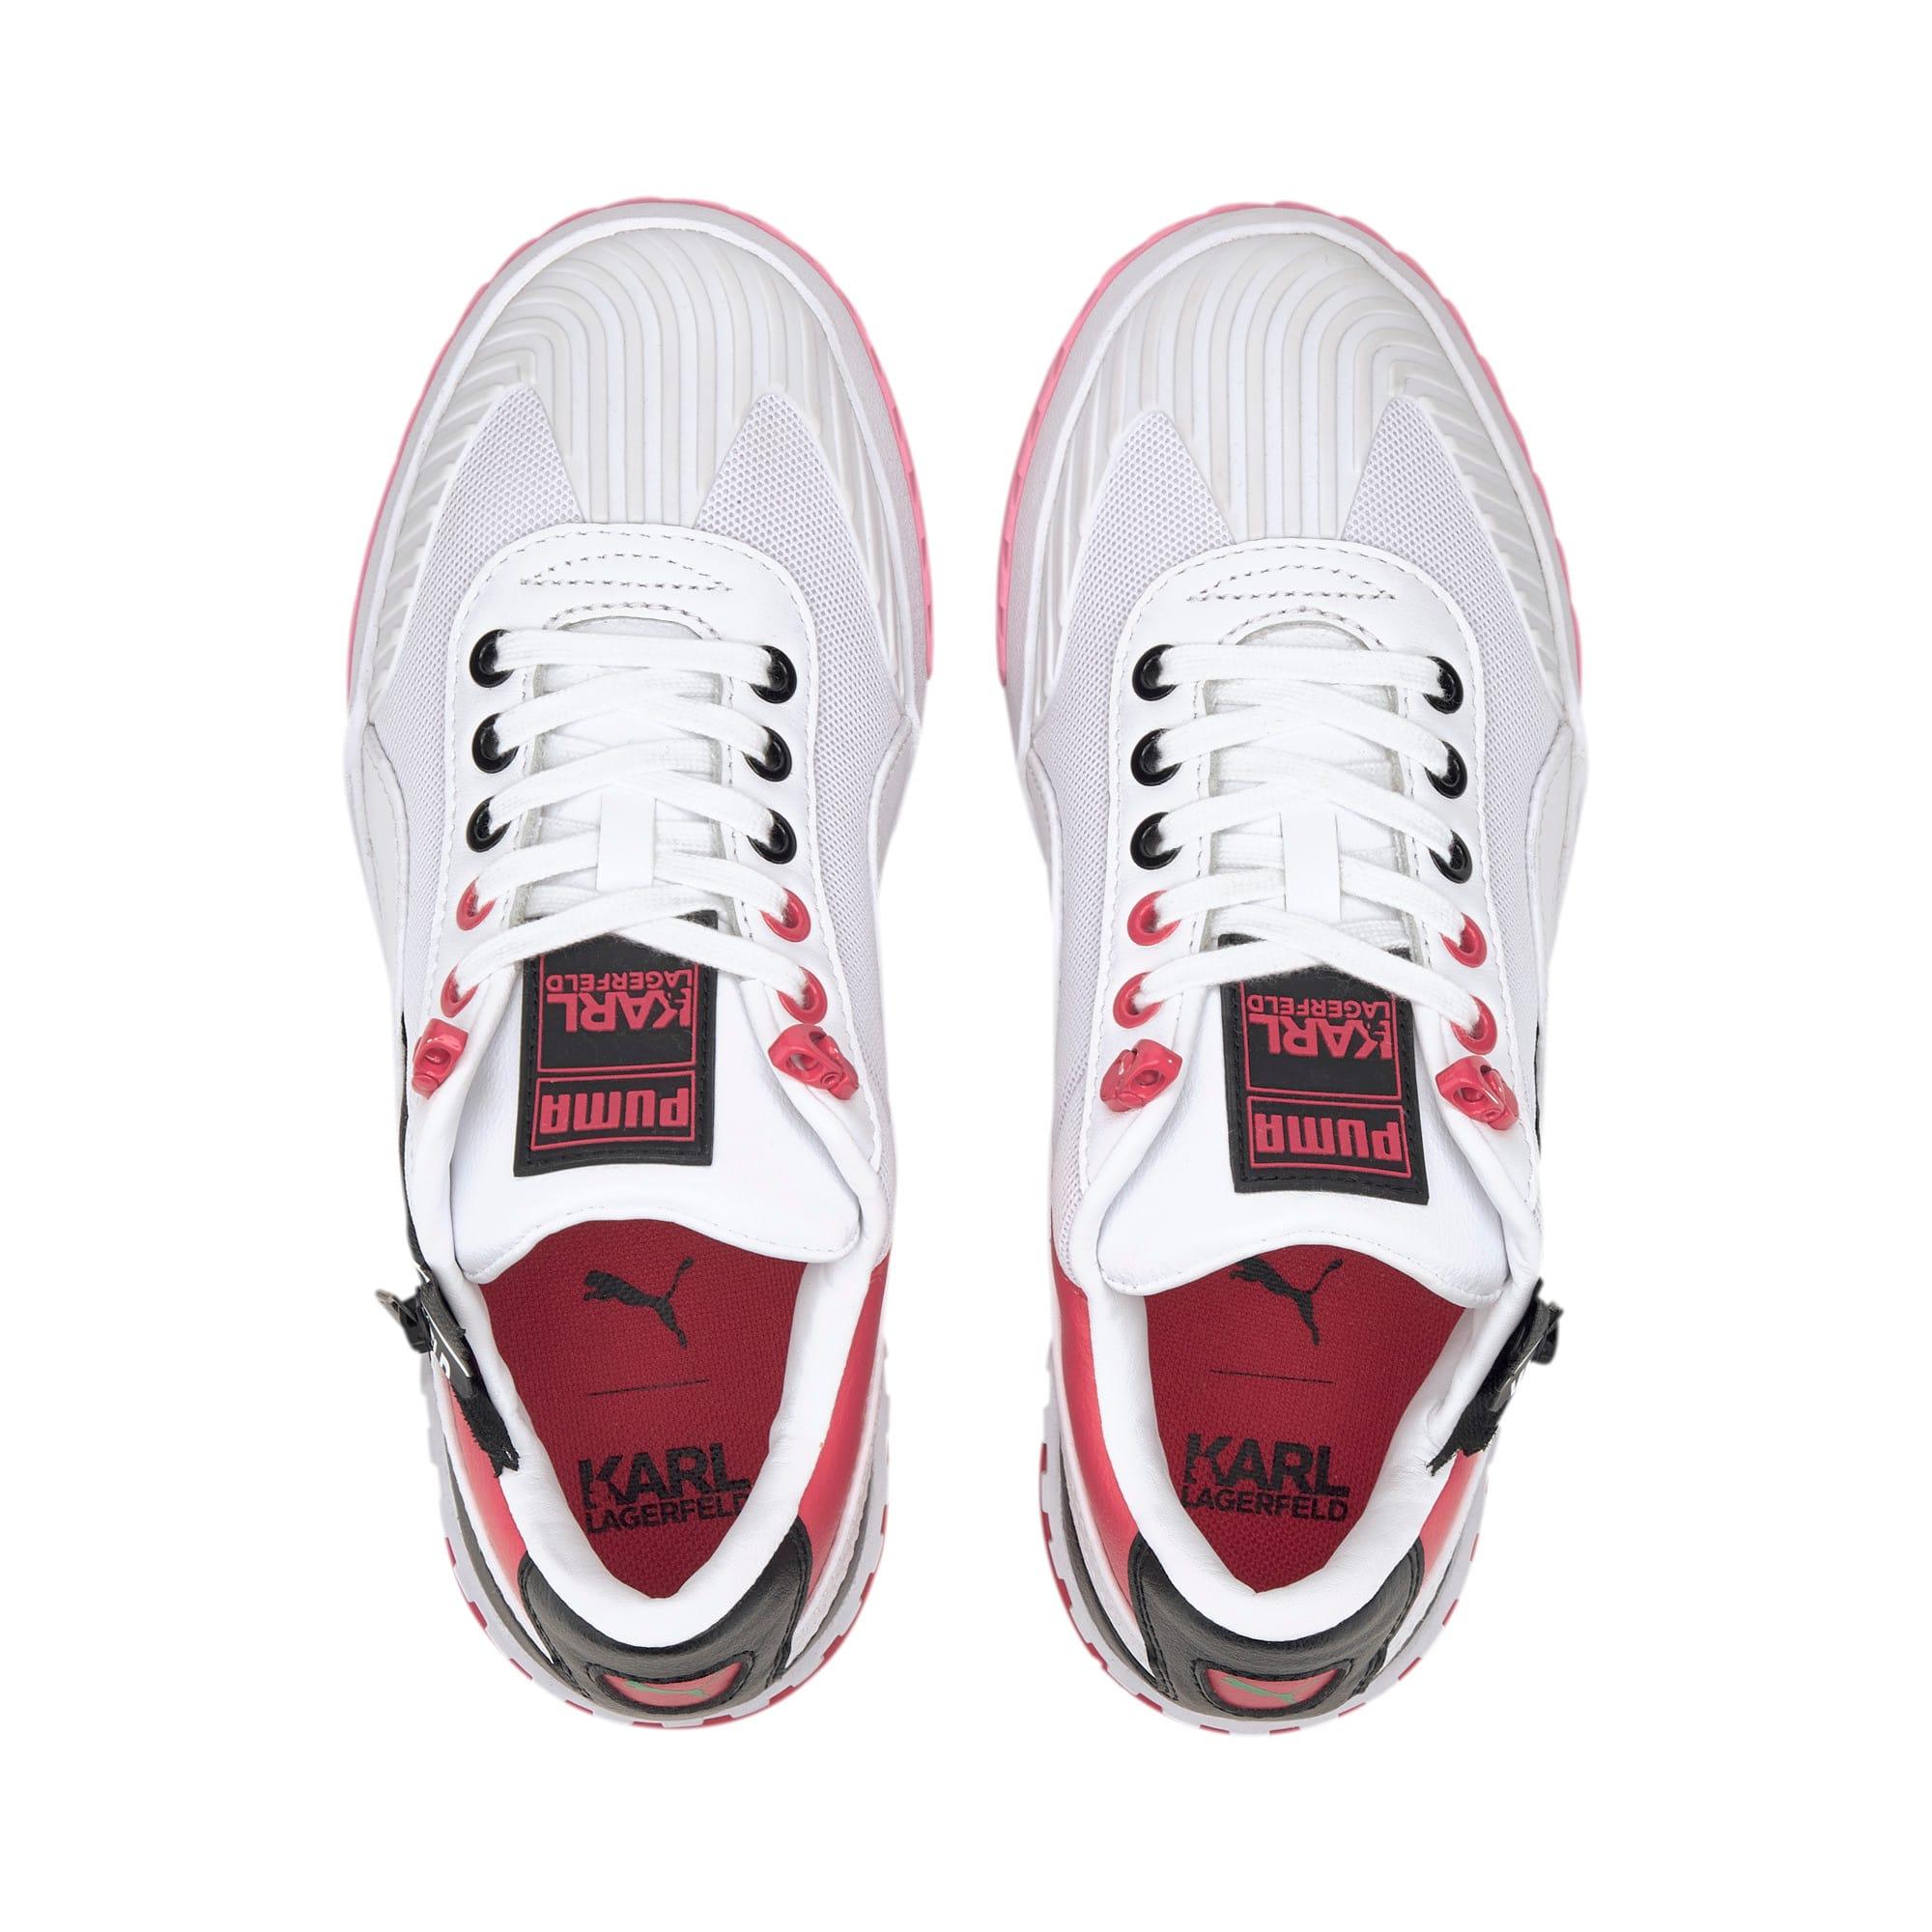 Thumbnail 7 of PUMA x KARL LAGERFELD Cali Women's Training Shoes, Puma White-PRISM PINK, medium